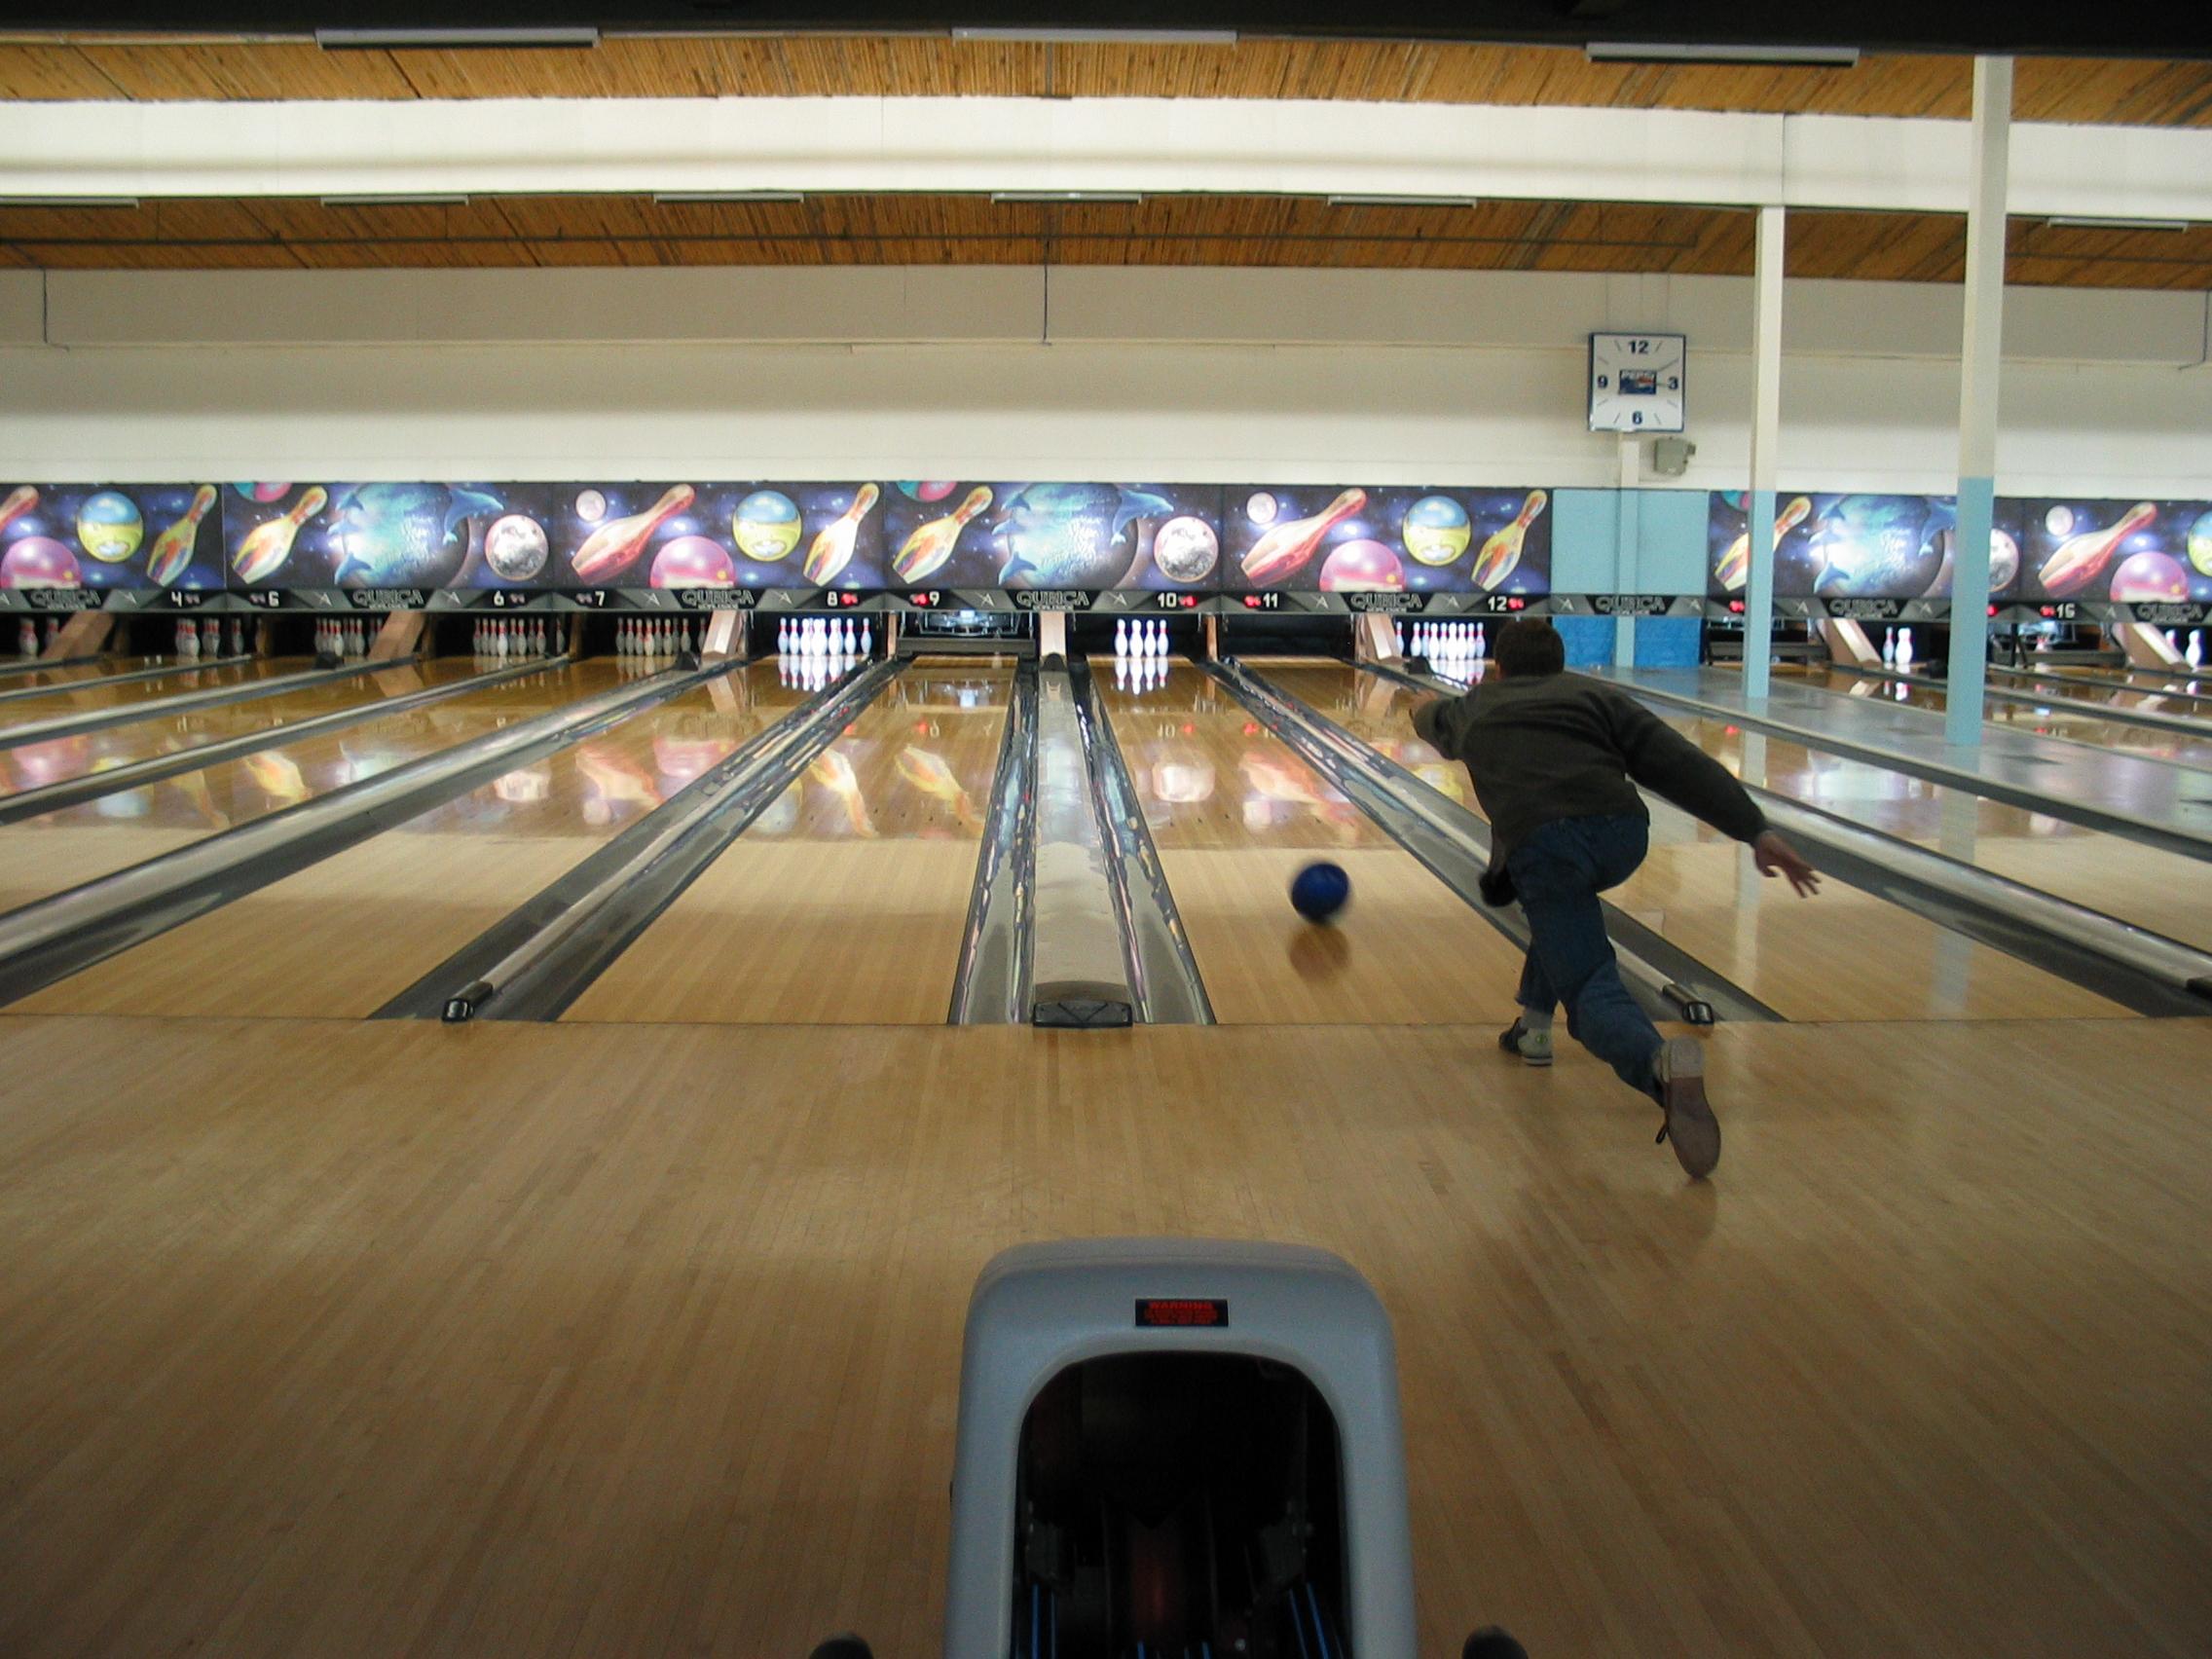 Island Park Bowling